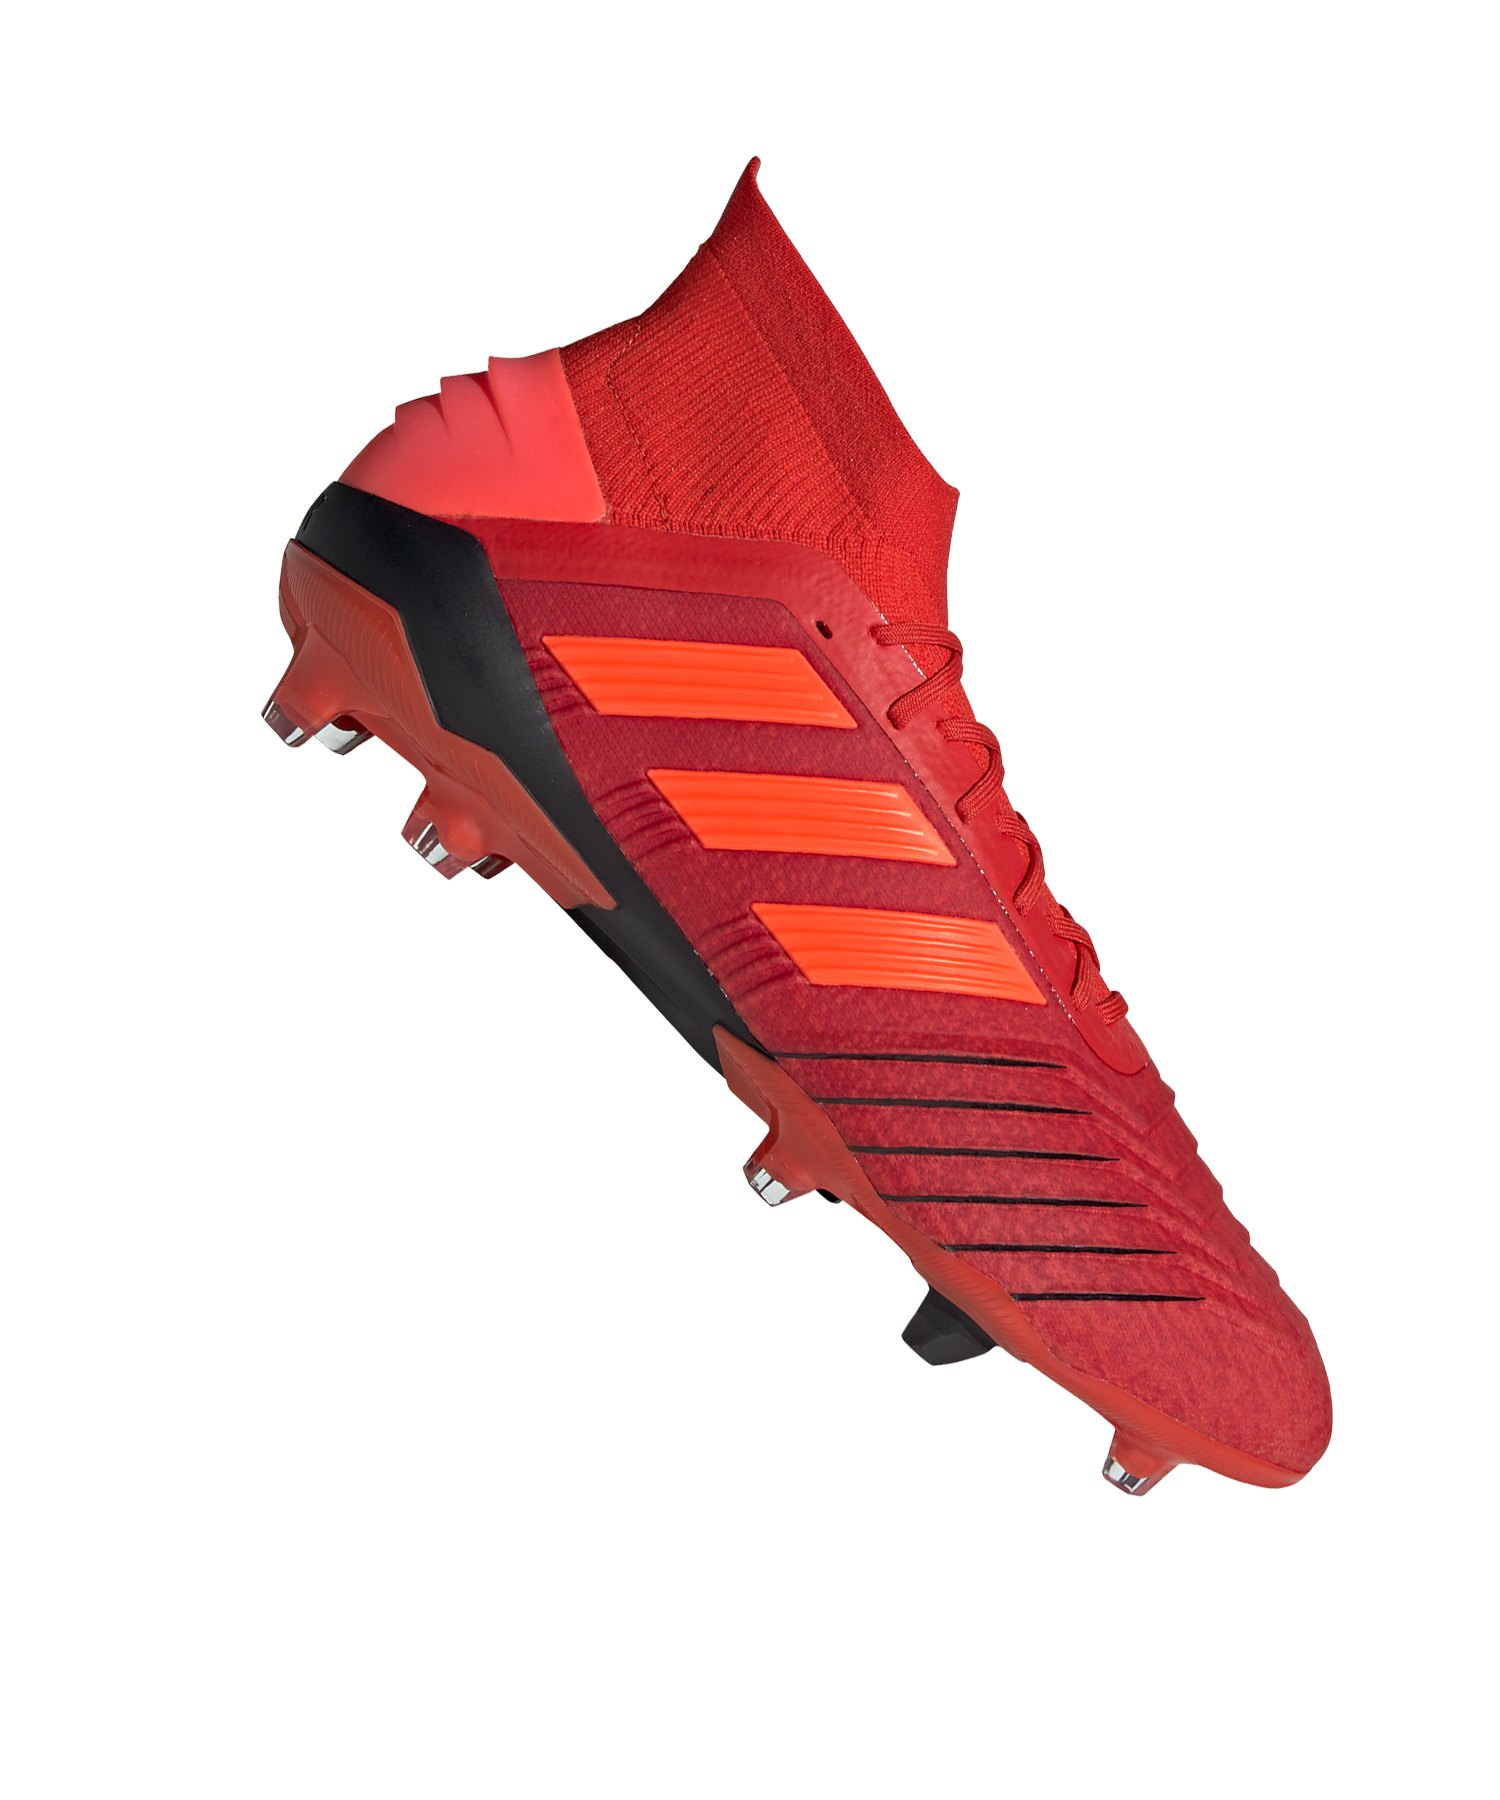 adidas Predator 19.1 FG Rot Schwarz